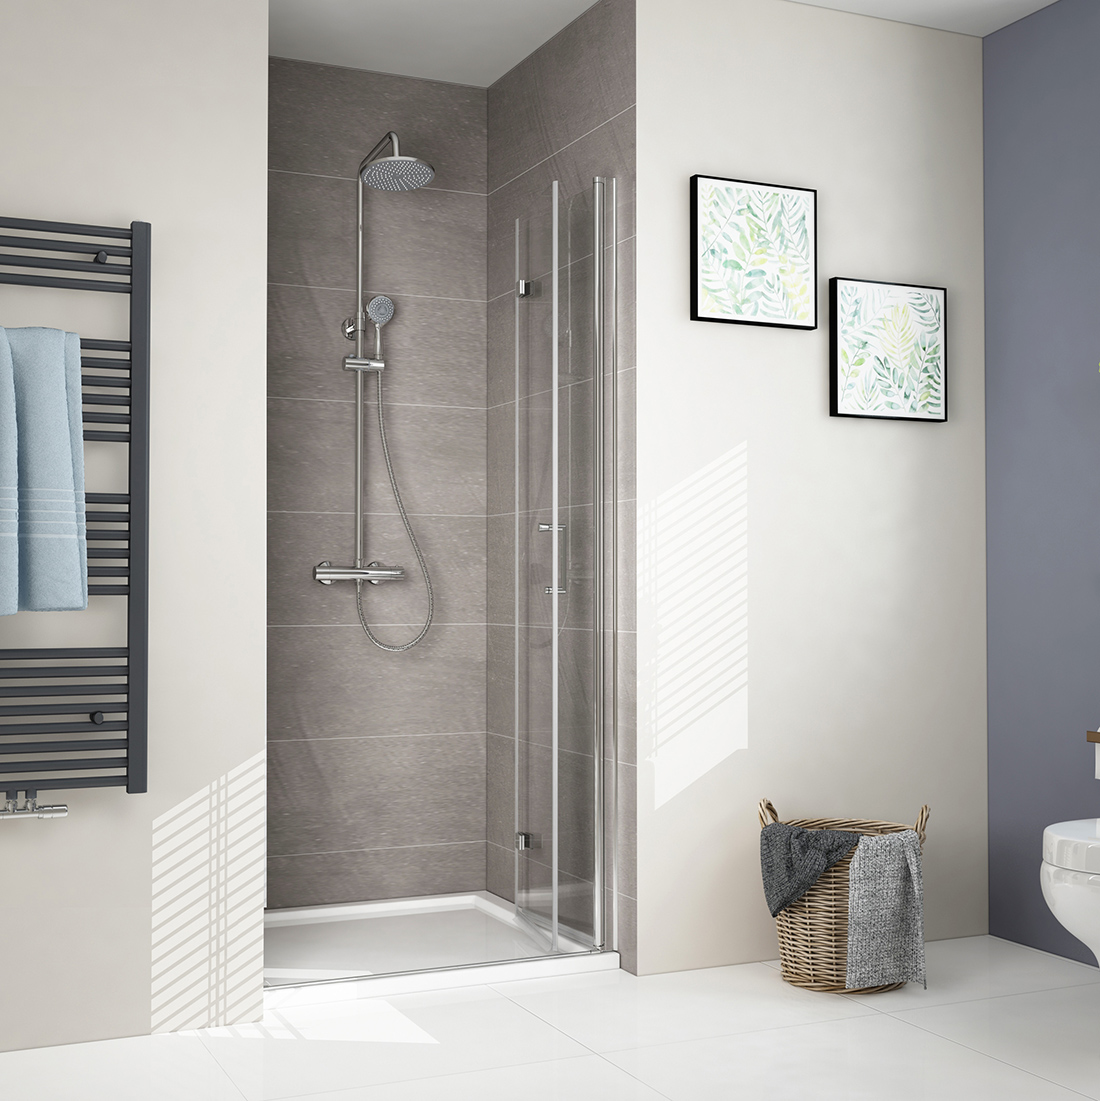 Details About New Bifold Frameless Shower Door Enclosure Hinge Bathroom 6mm Glass Screen Uk